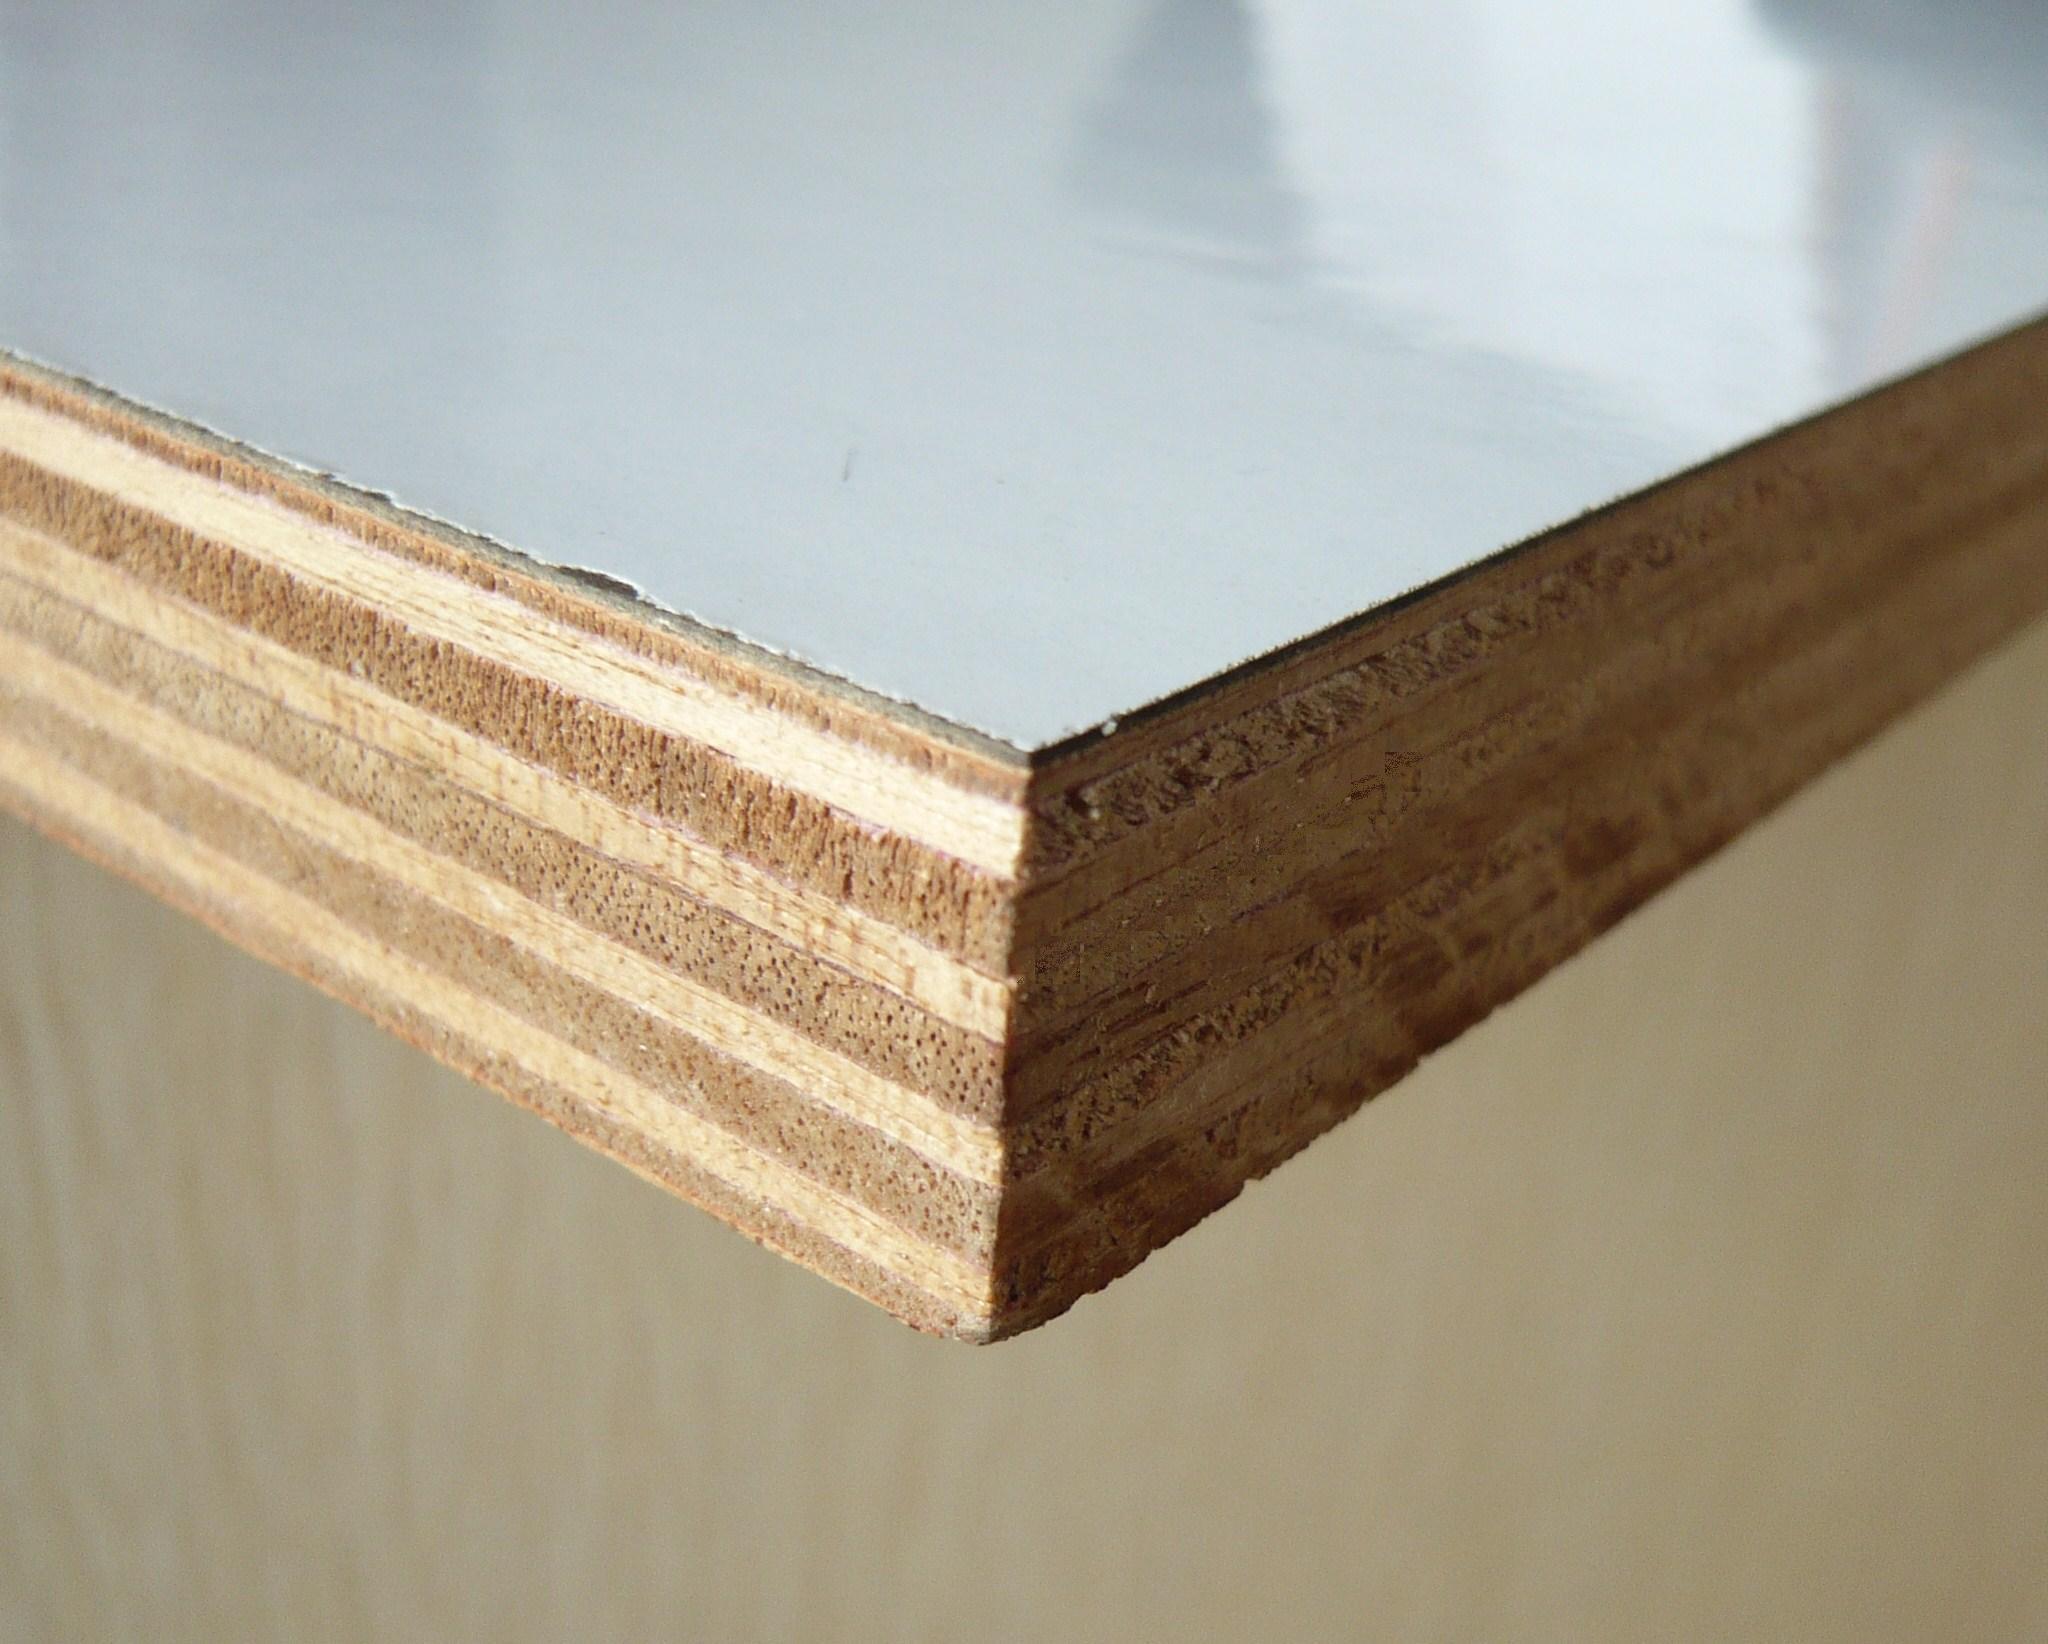 Madera contrachapada del formica madera contrachapada for Formica madera